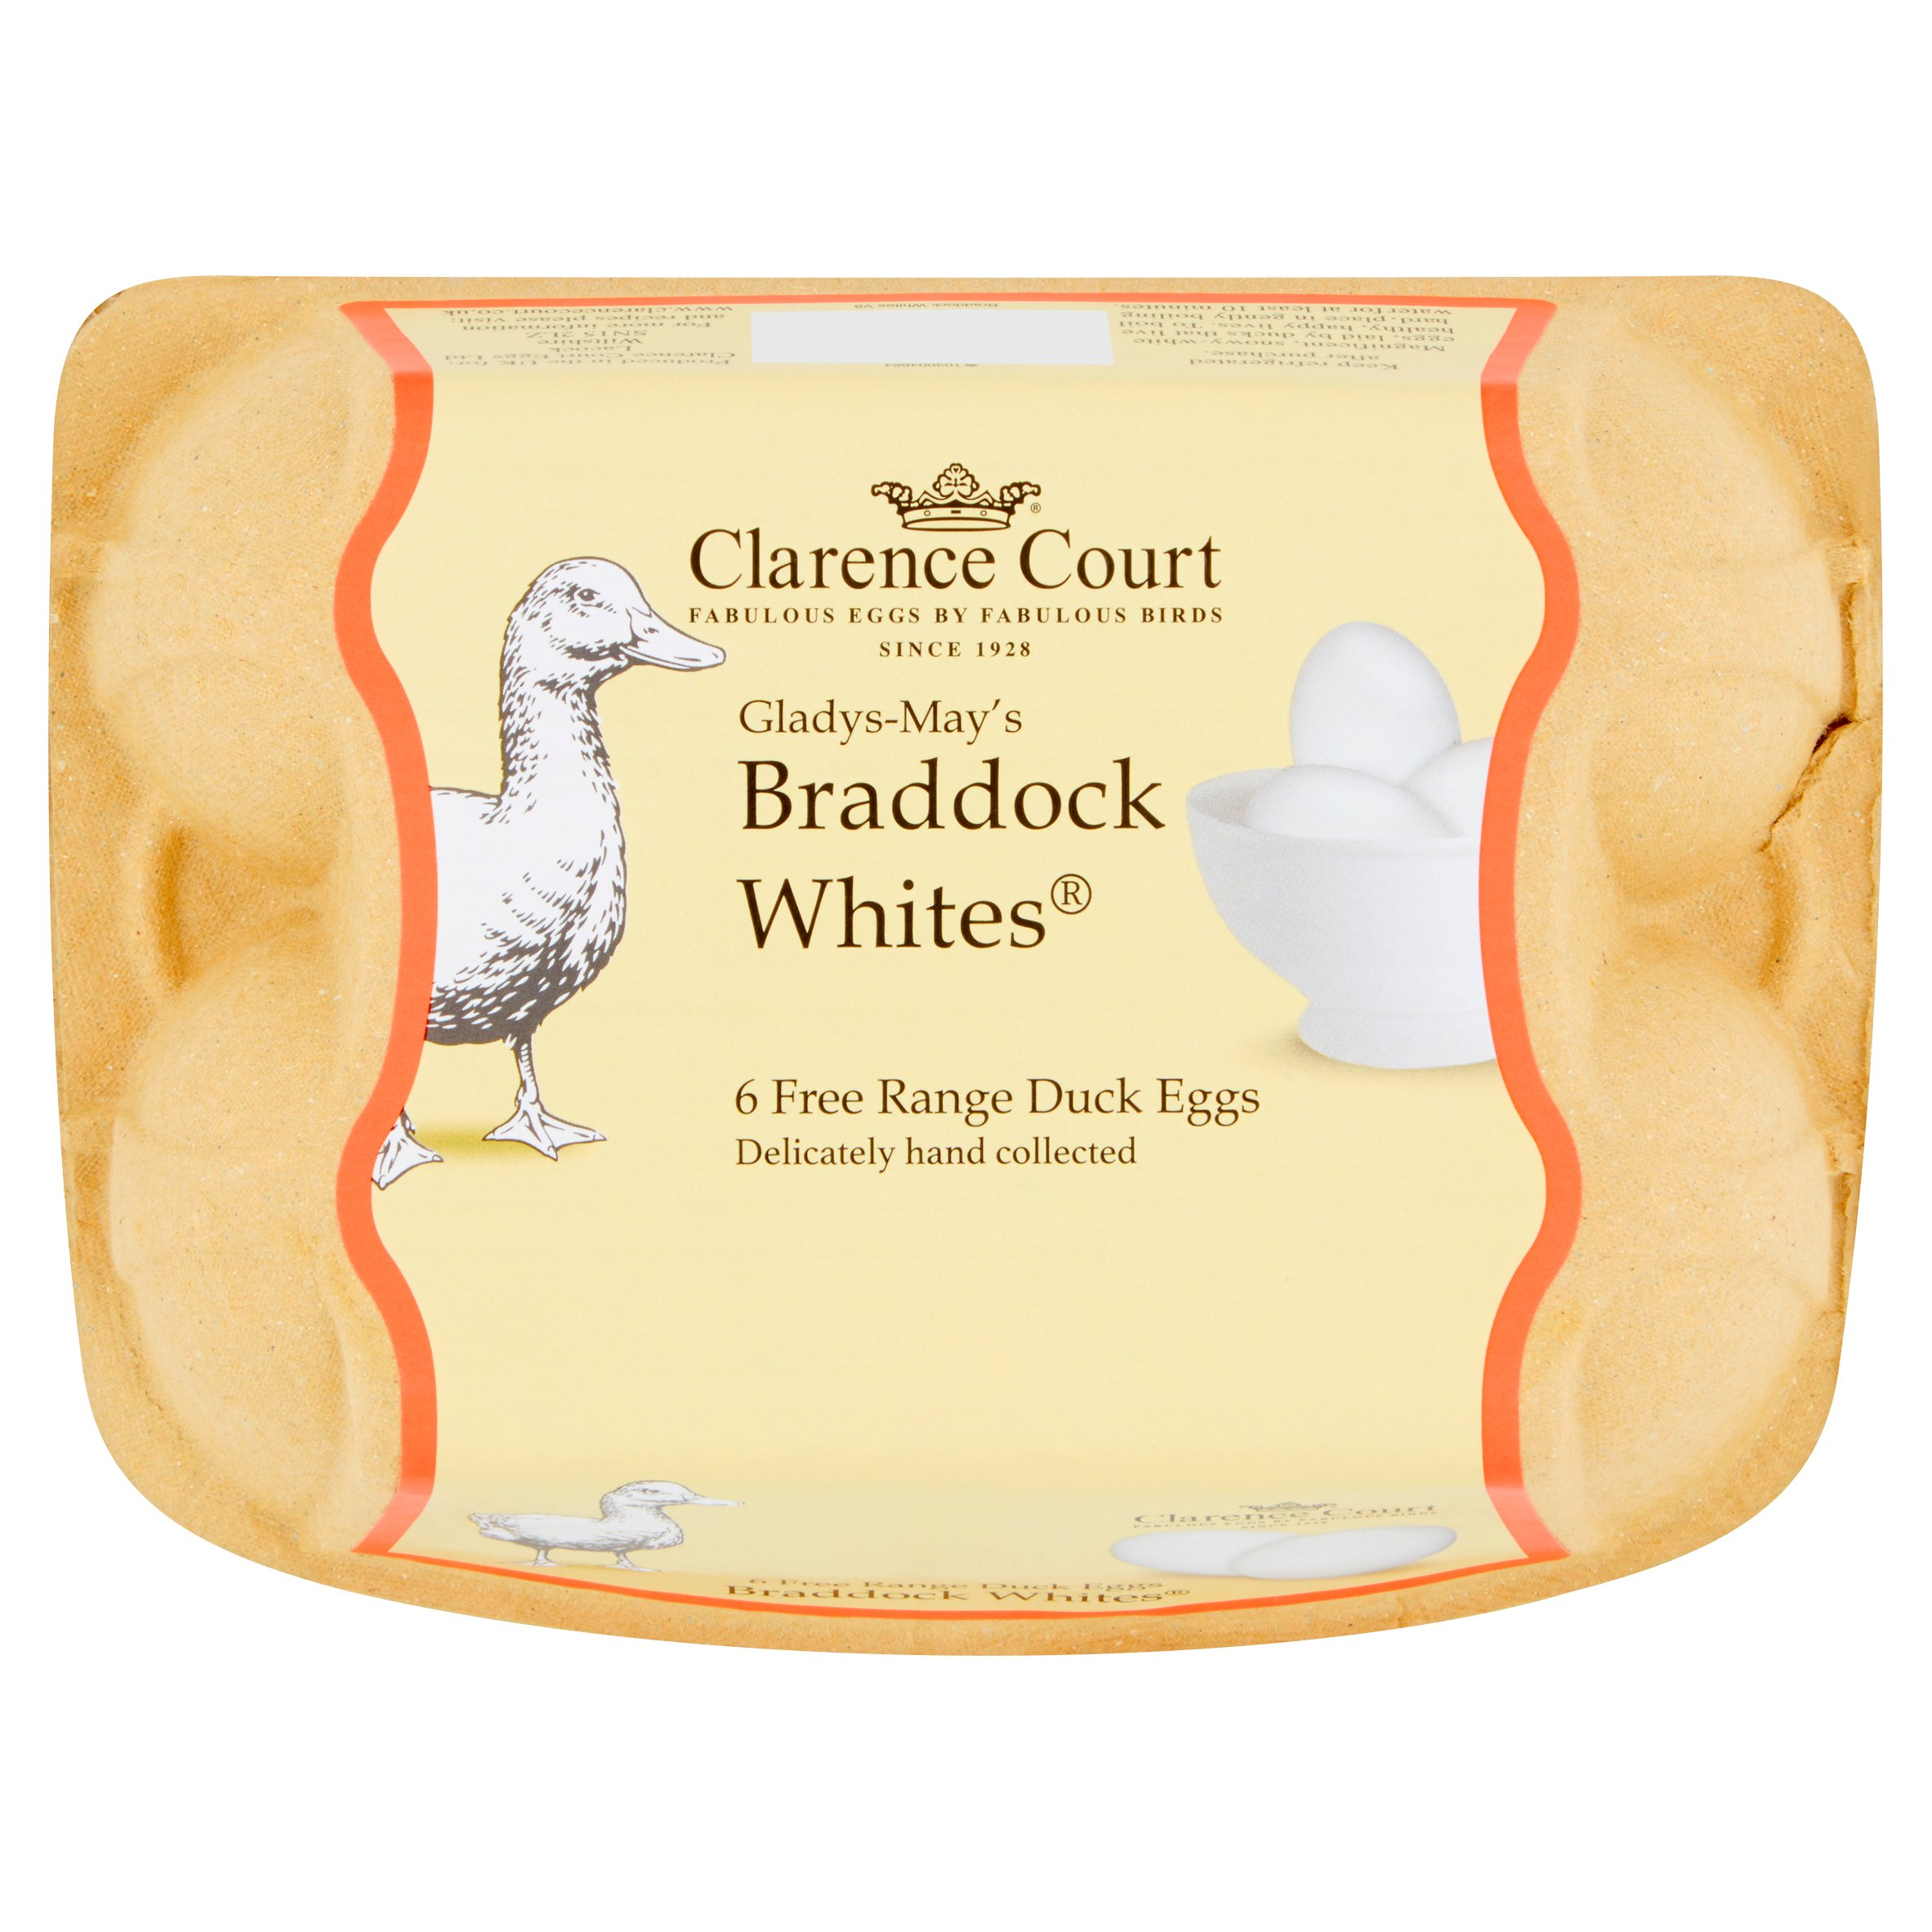 Clarence Court Braddock White Duck Free Range Eggs 6 Pack